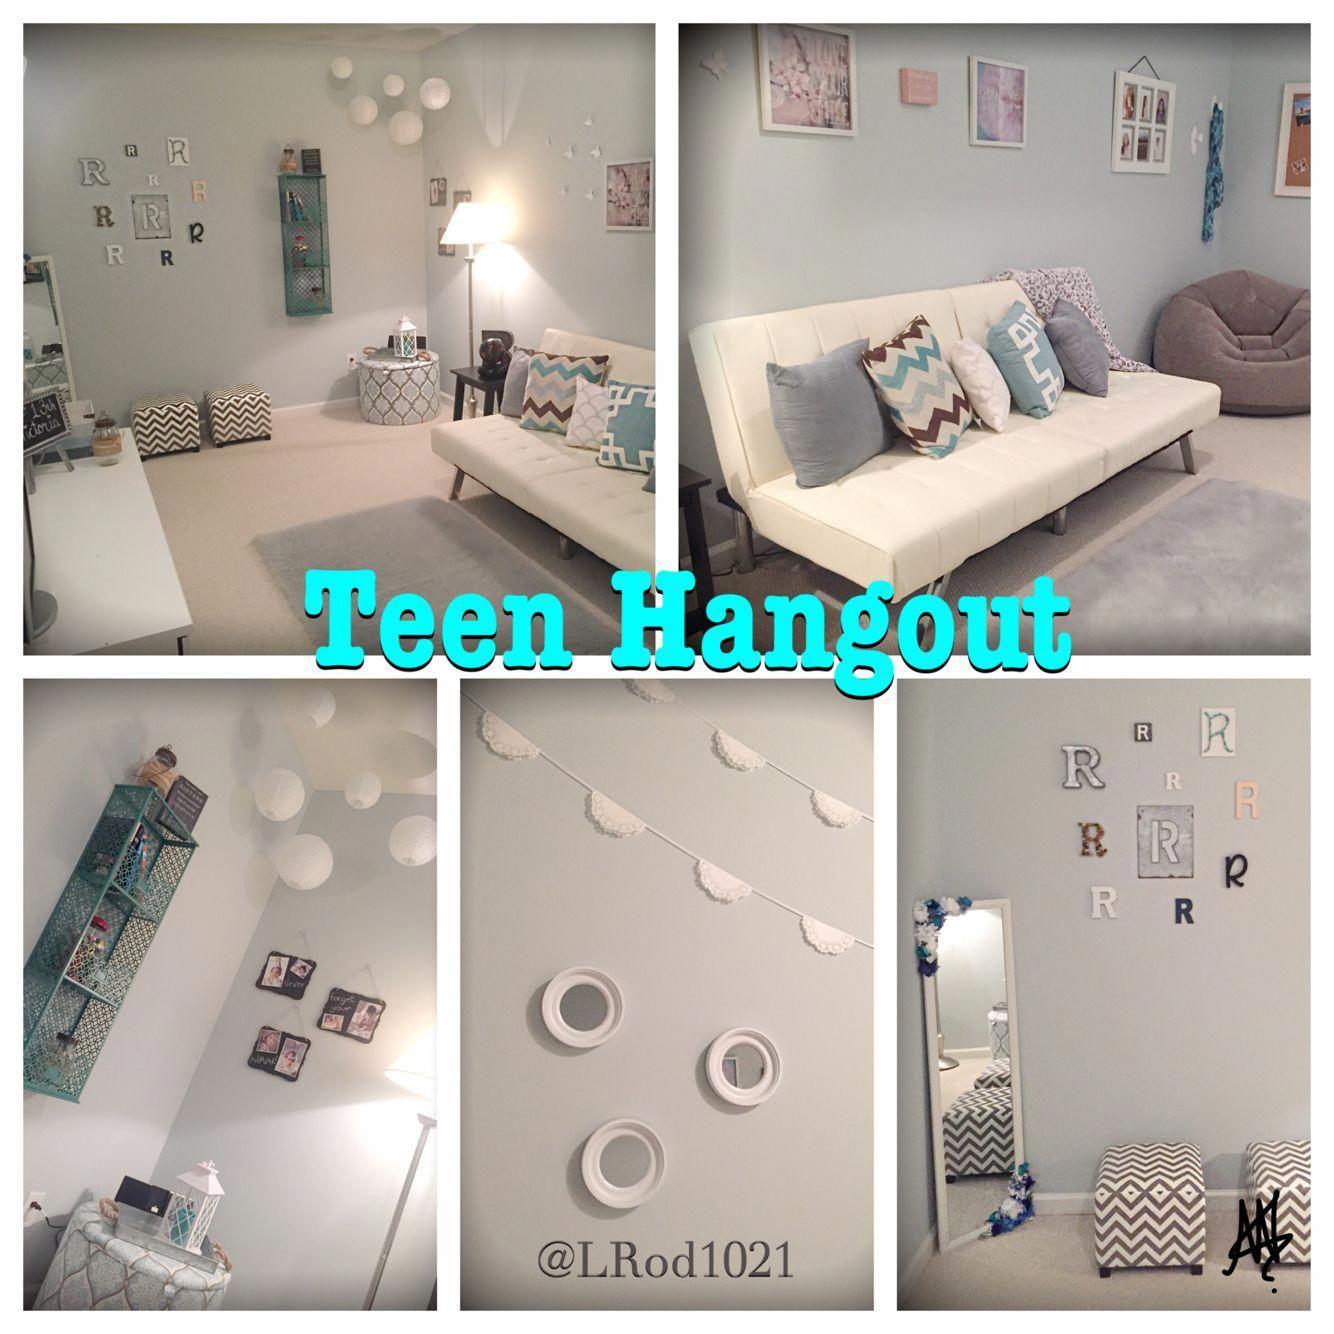 Pin On Hobbies For Teenage Girls